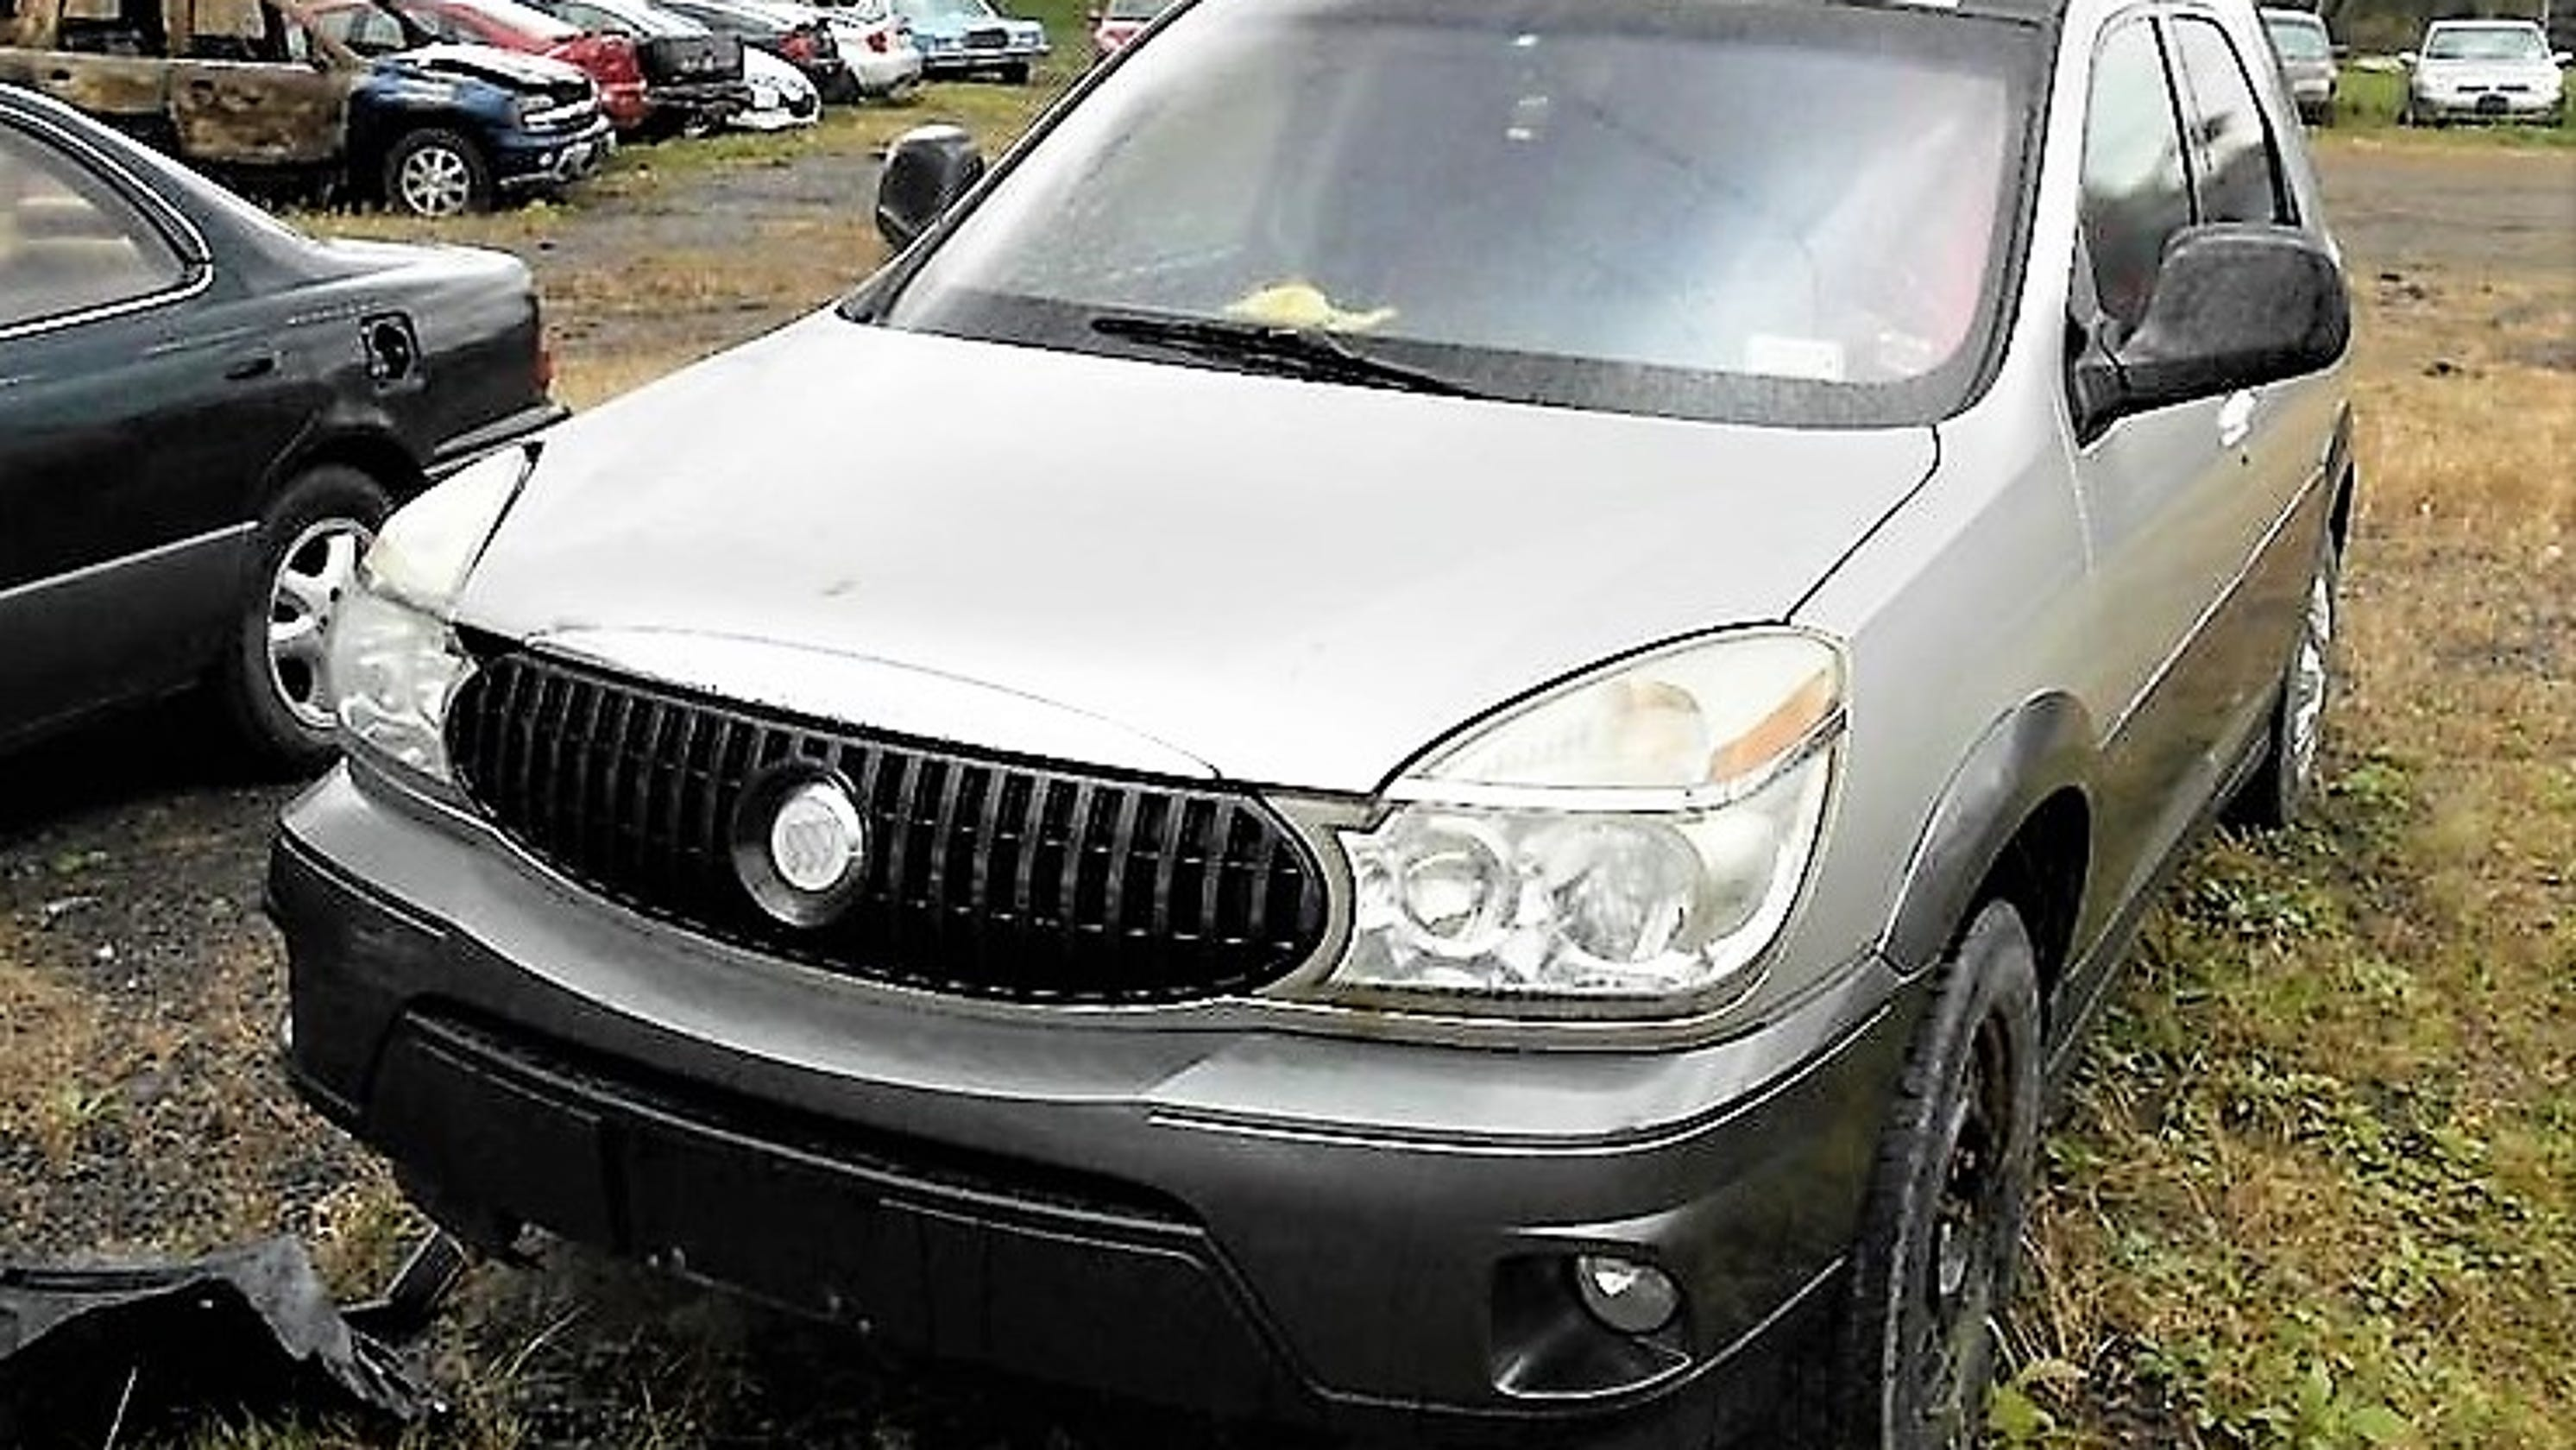 Car Auctions Online >> Elmira Police Department Holds Online Vehicle Auction